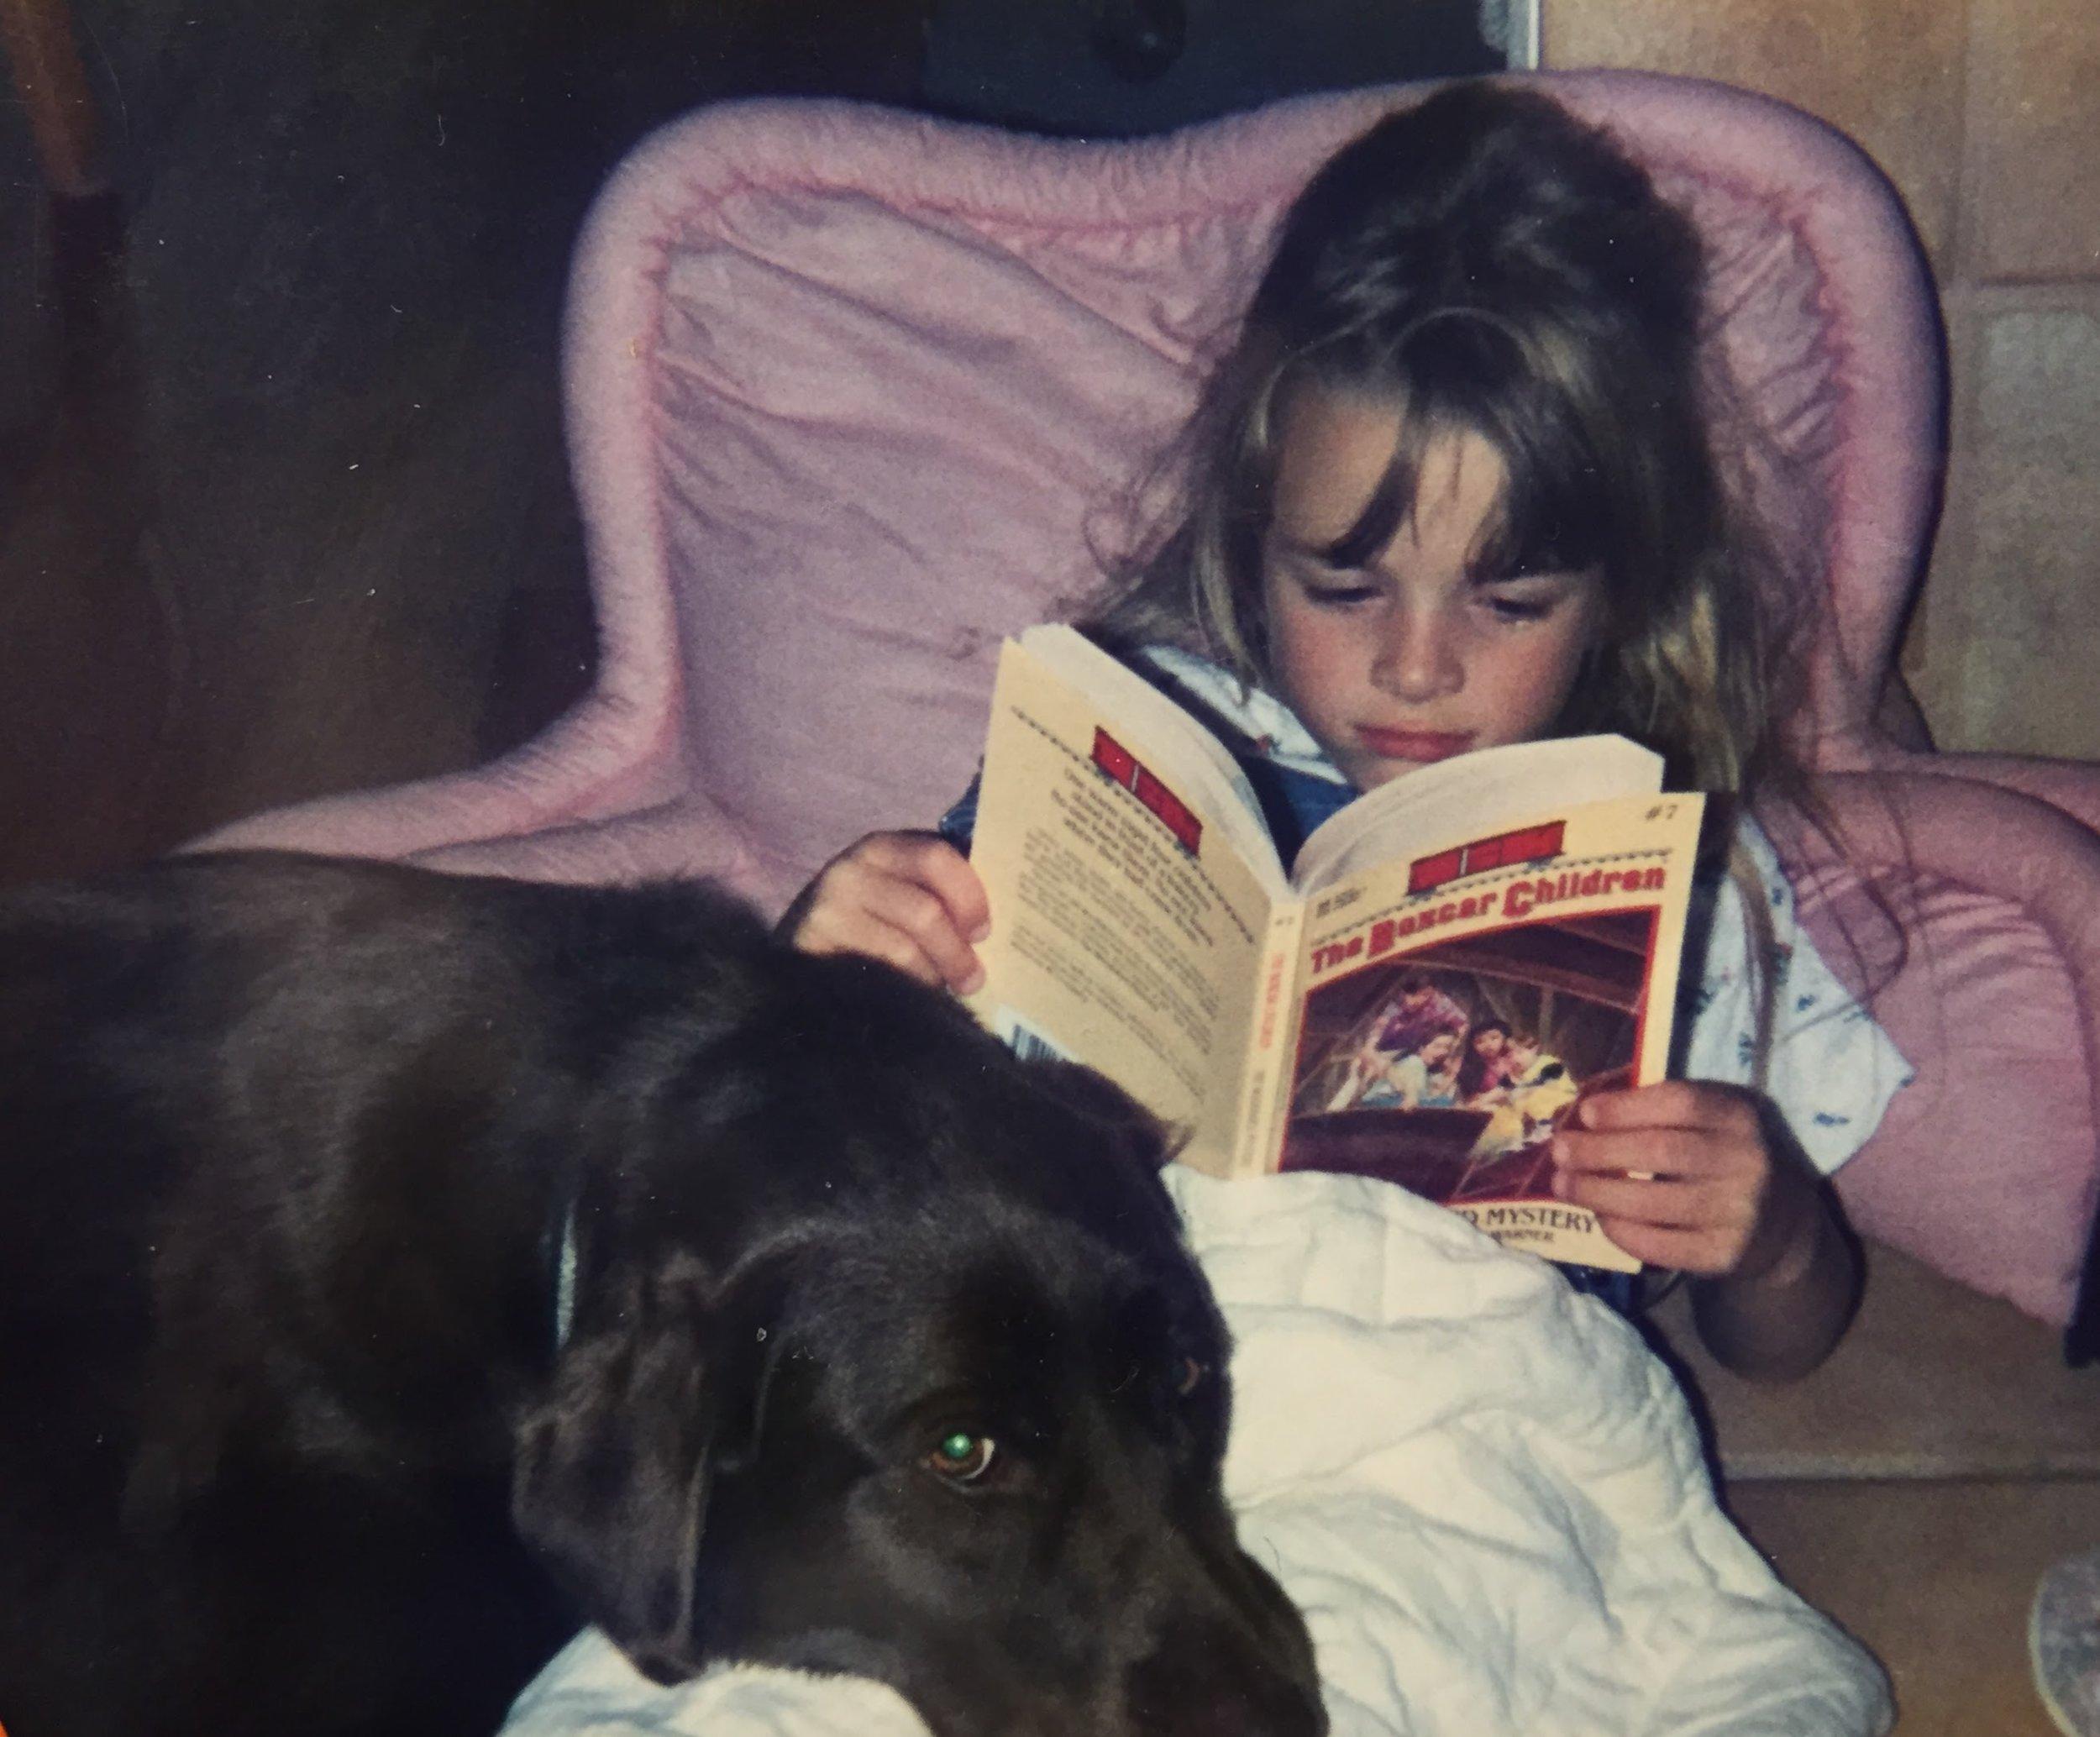 Me reading with Fudge, circa 1995.